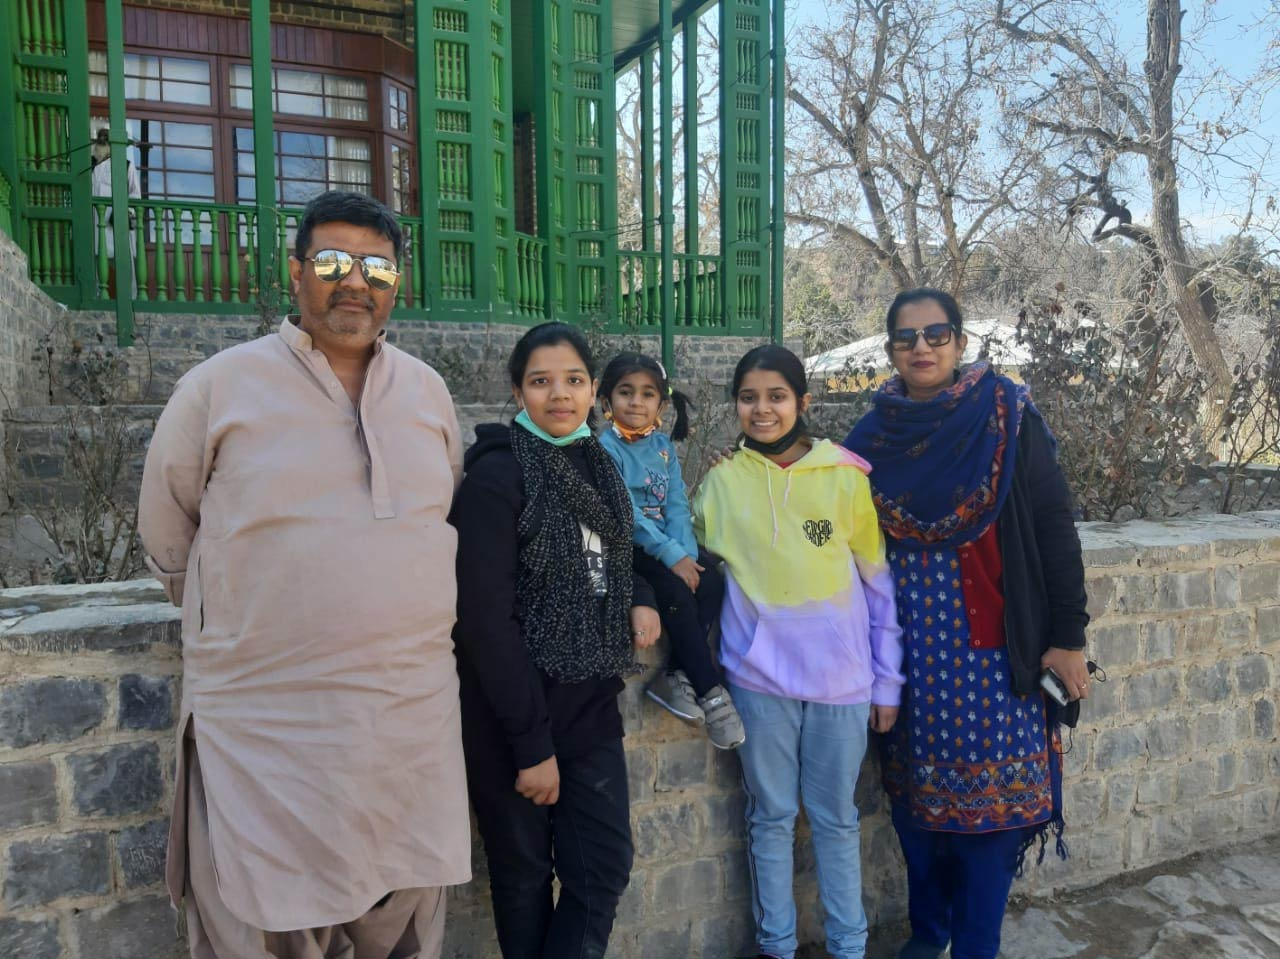 Imran, Zoya, Ayesha, Zara and Erum having fun at the residency.